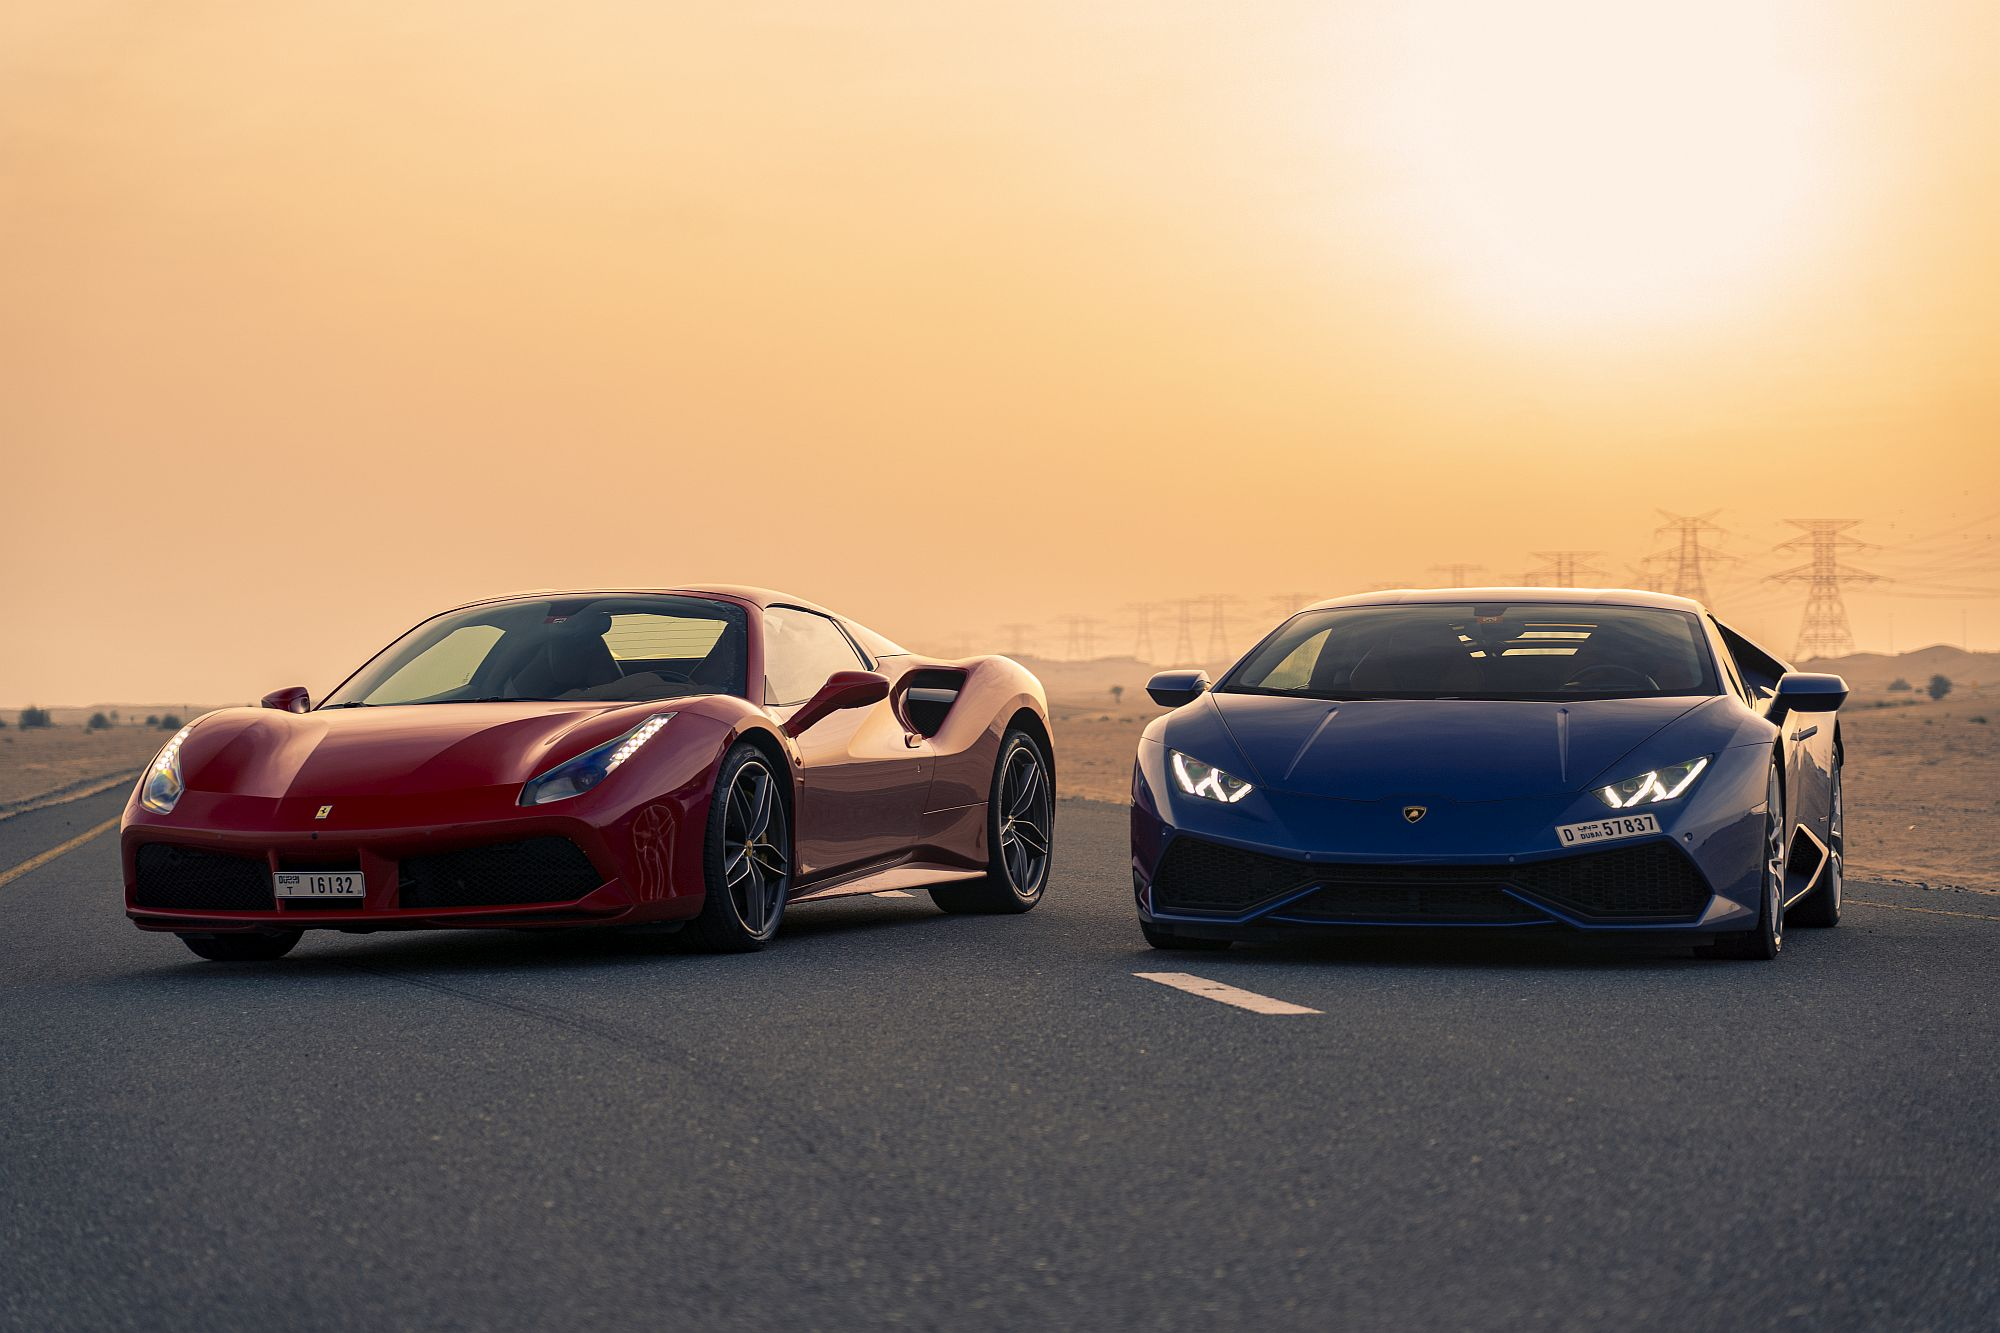 Sales increase luxury cars covid 19